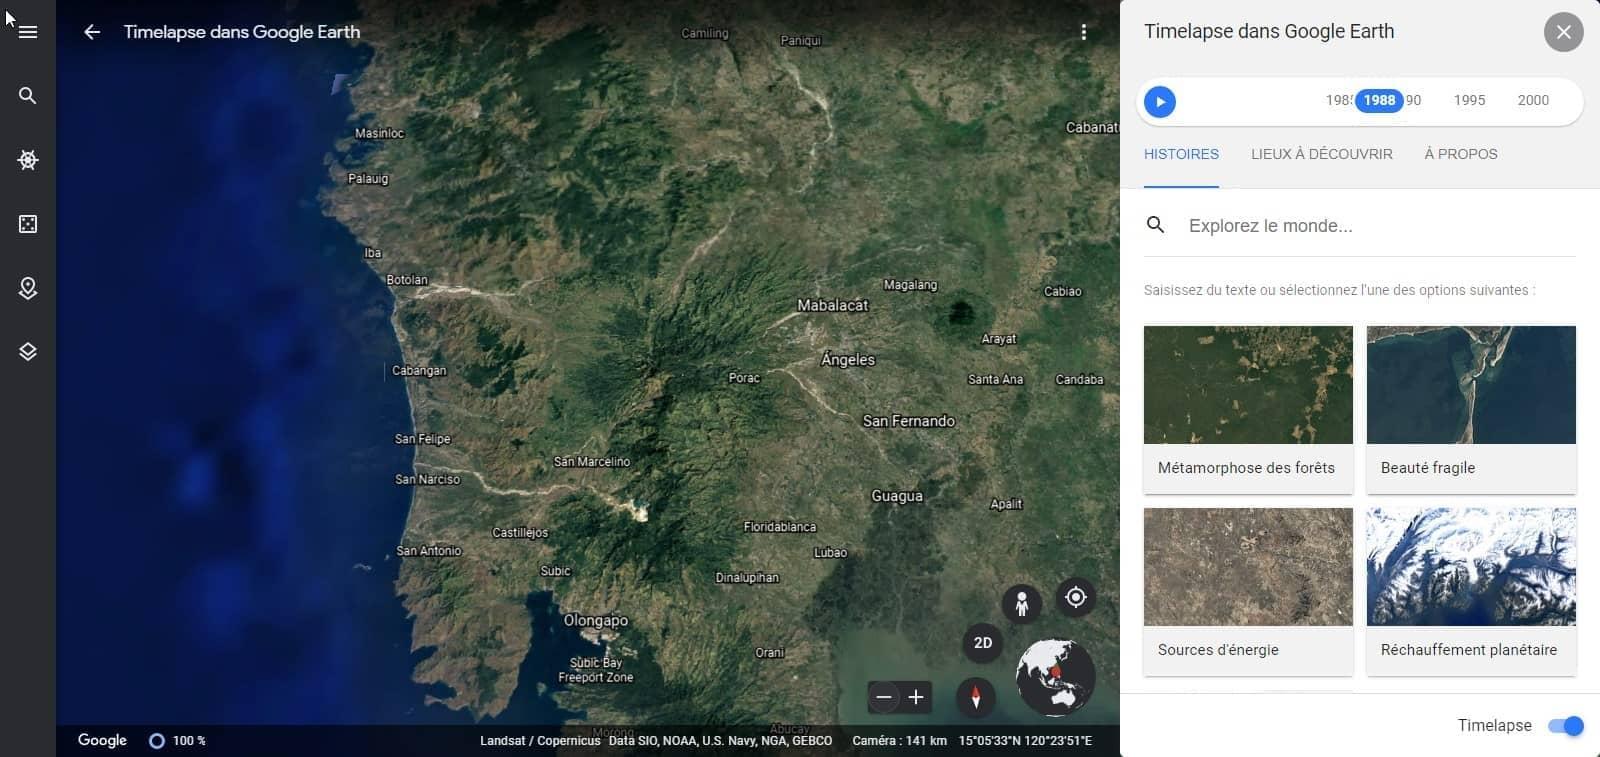 Google Earth Timelapse de 1984 à 2020